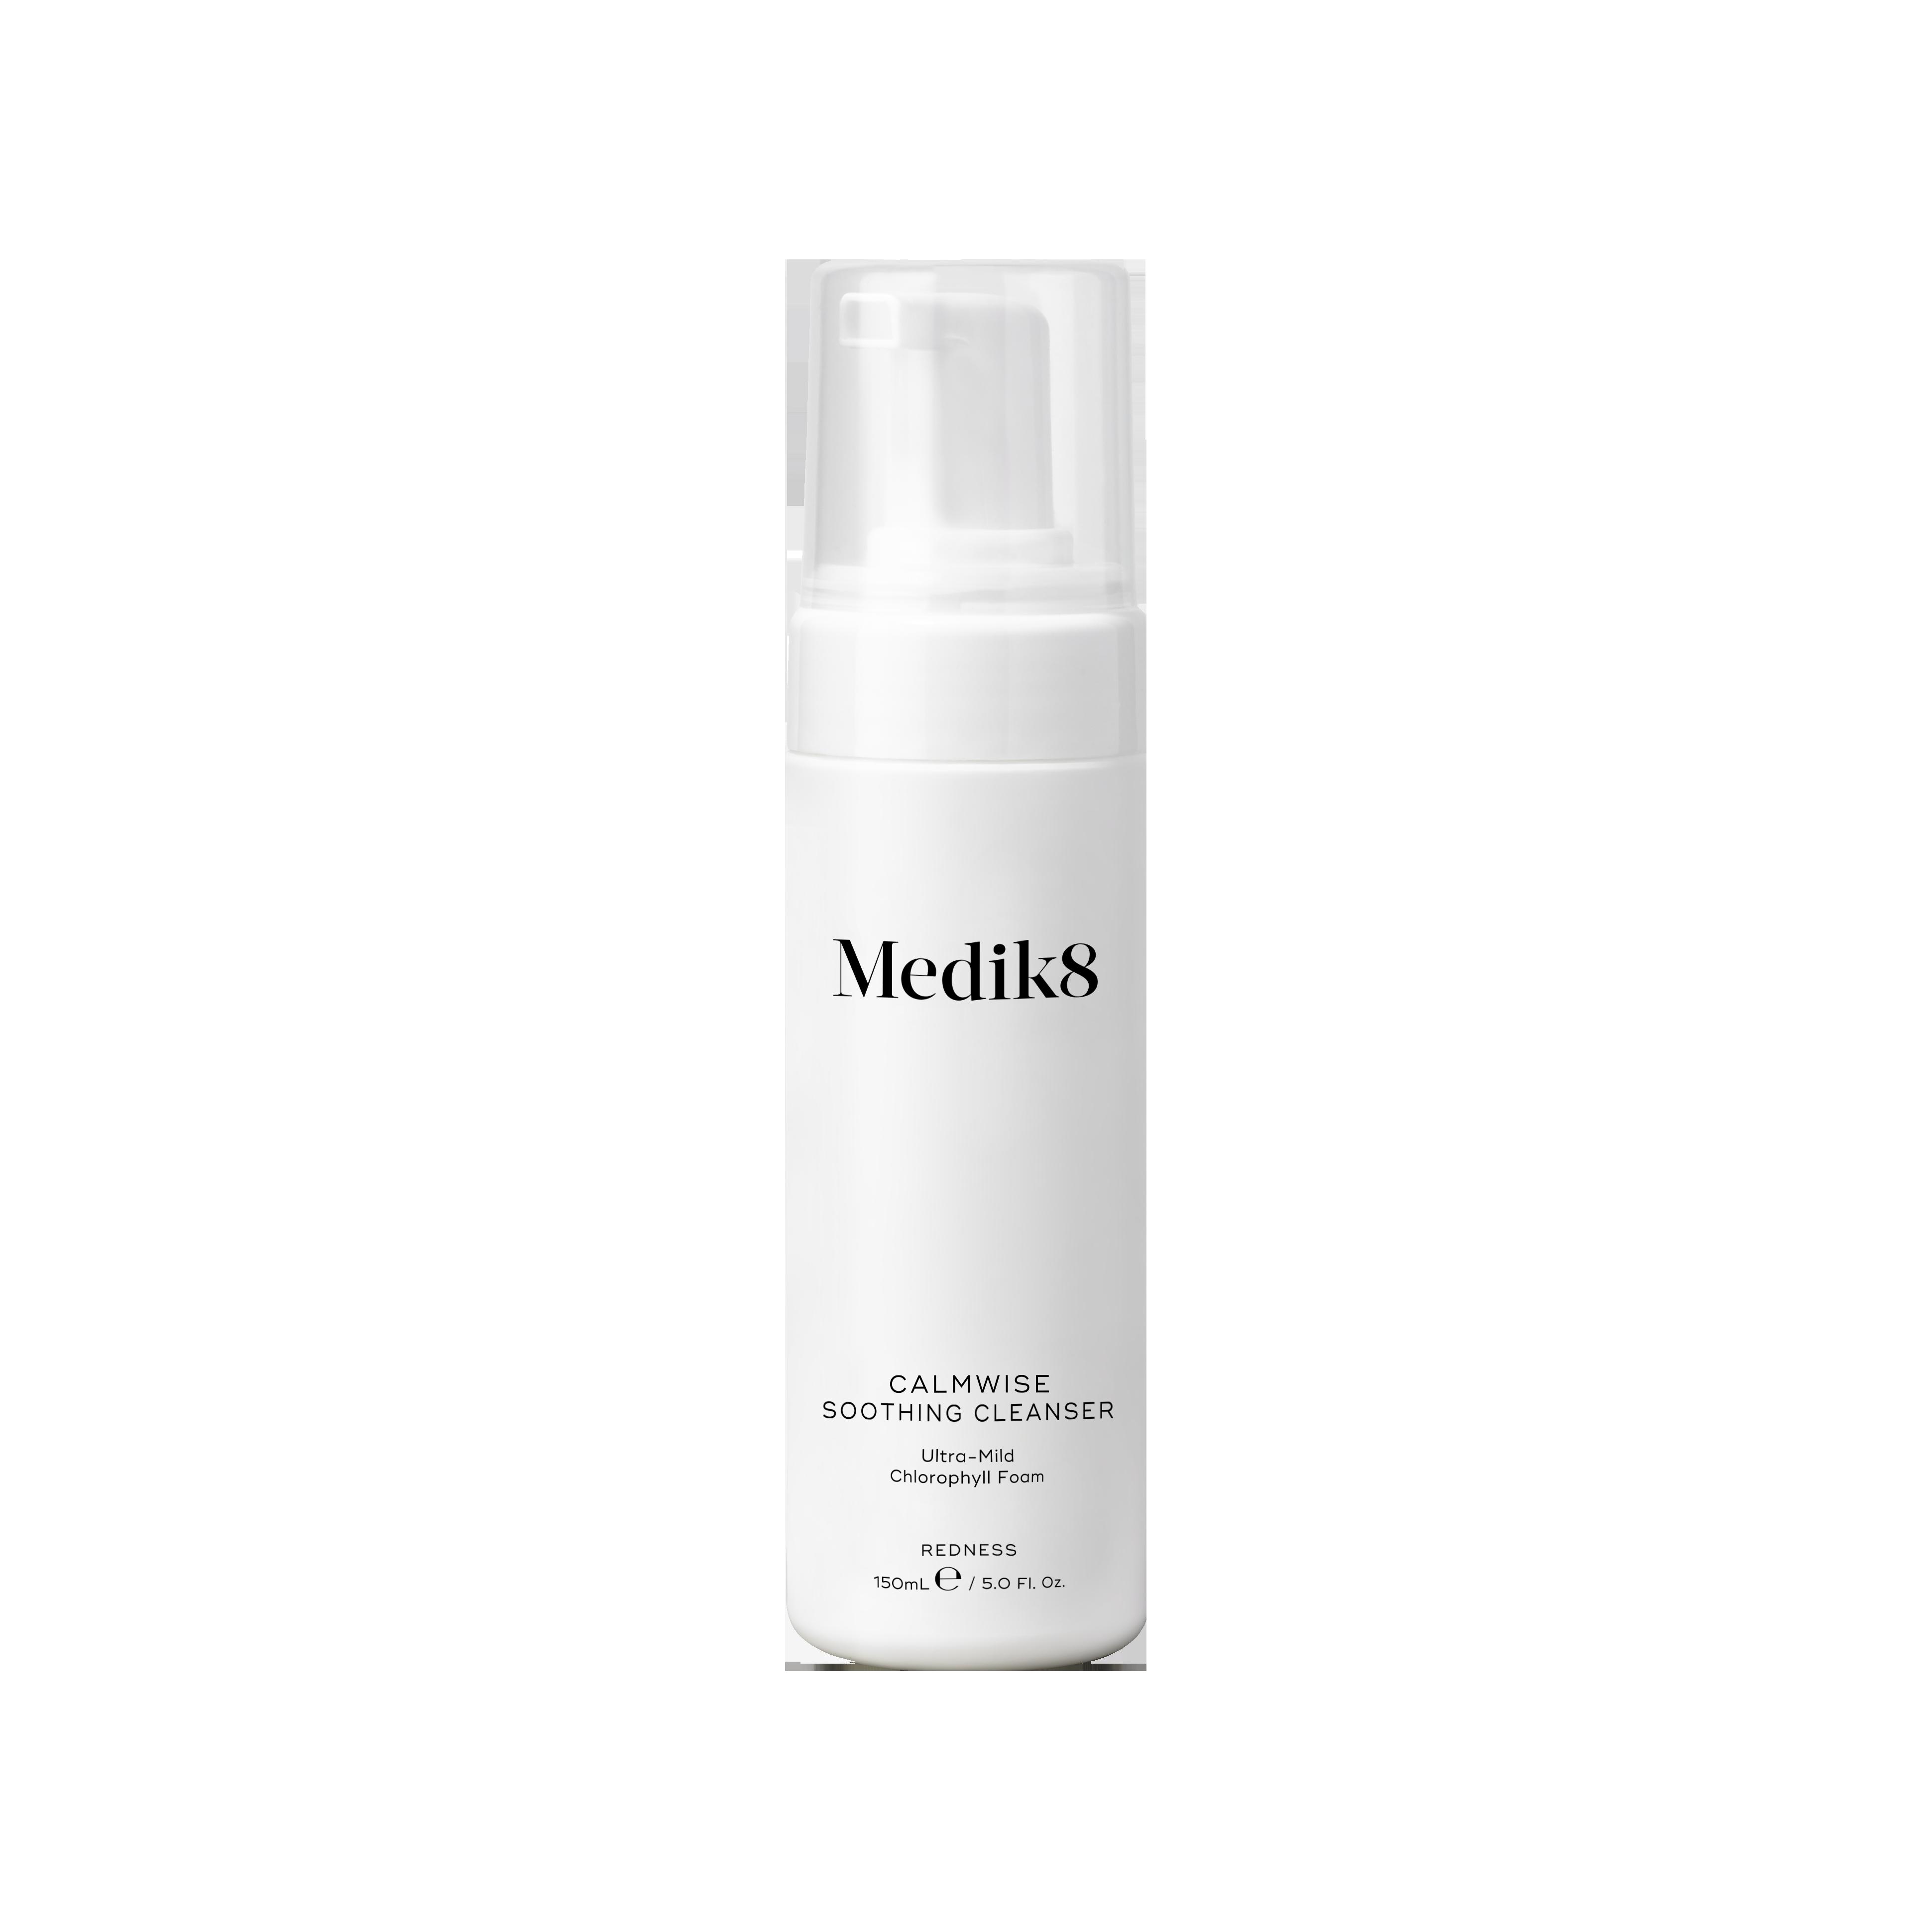 Medik8 soothing calmwise cleanser edinburgh